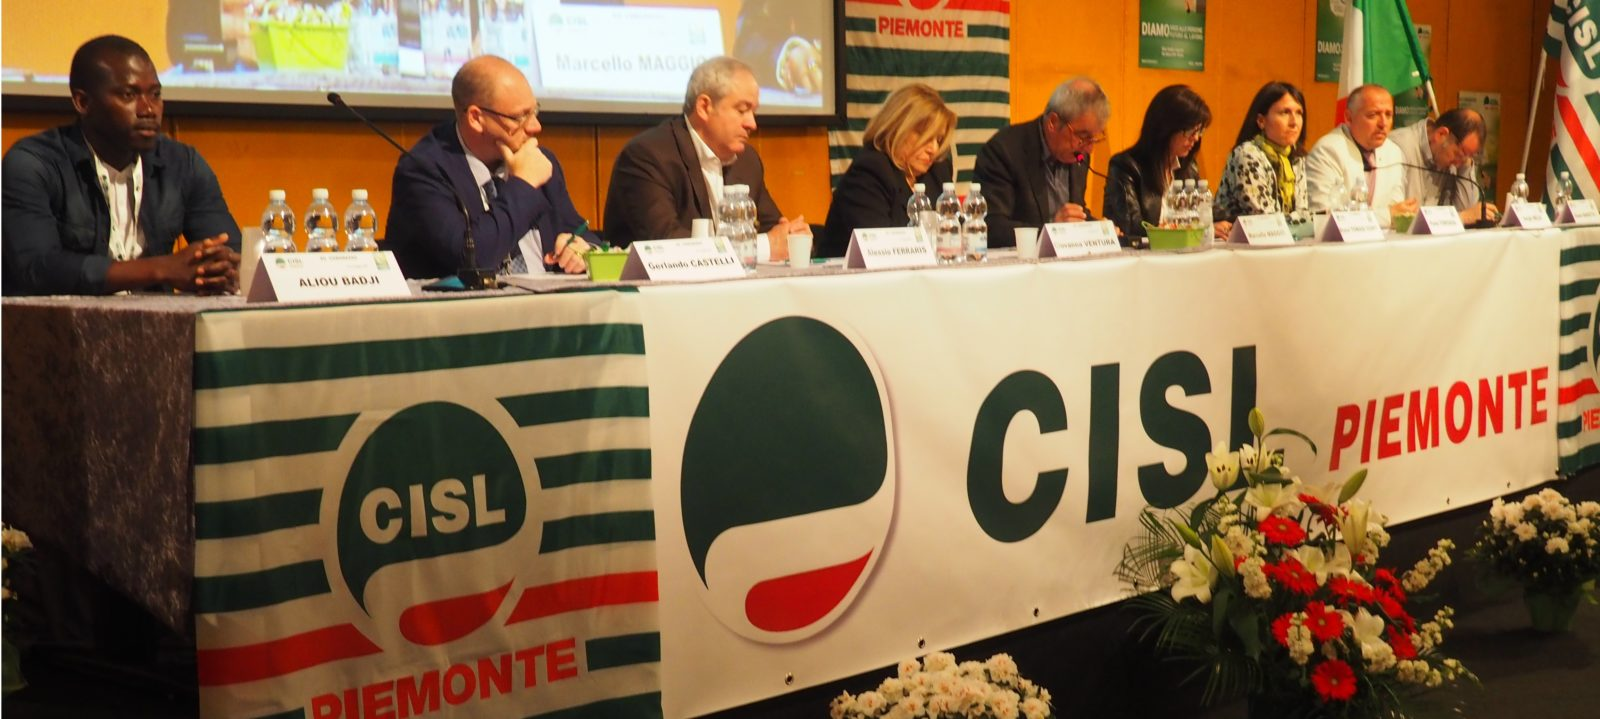 XII Congresso Cisl Piemonte